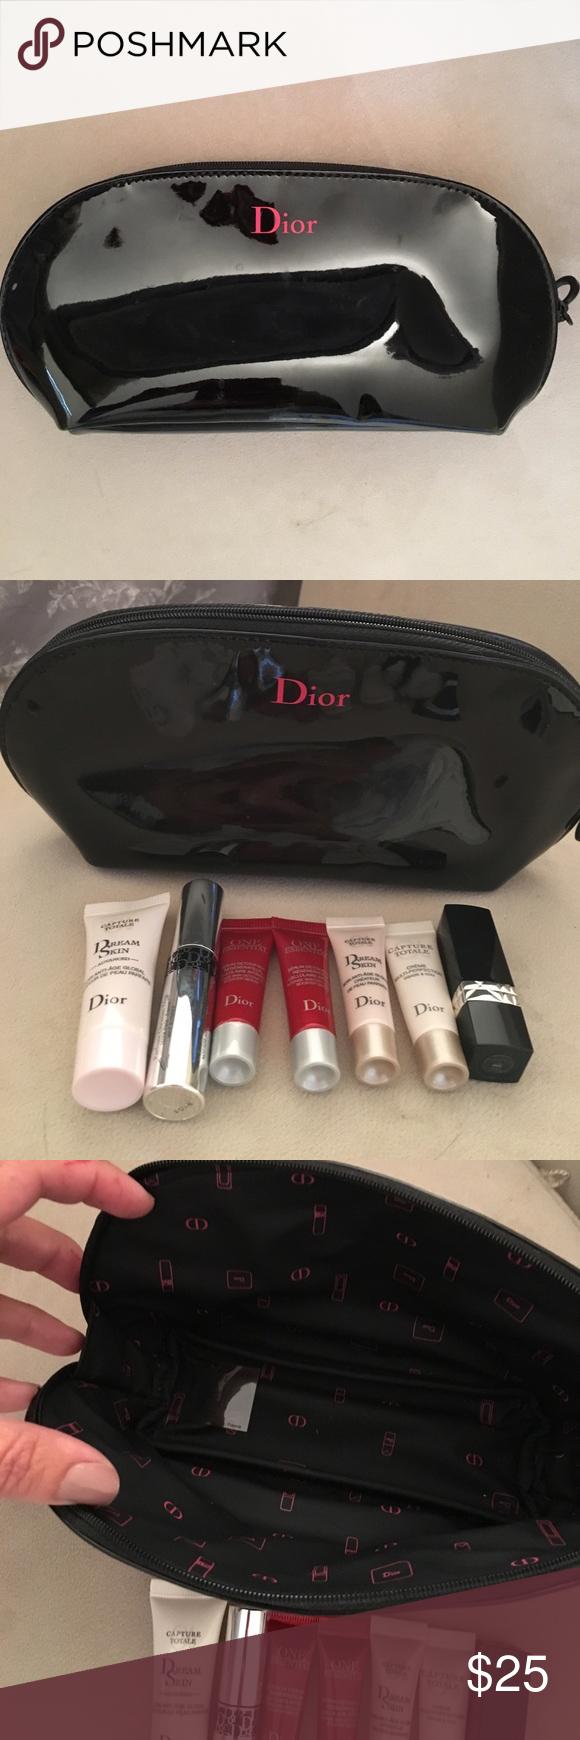 NWOT Authentic Christian Dior makeup bag & samples NWOT